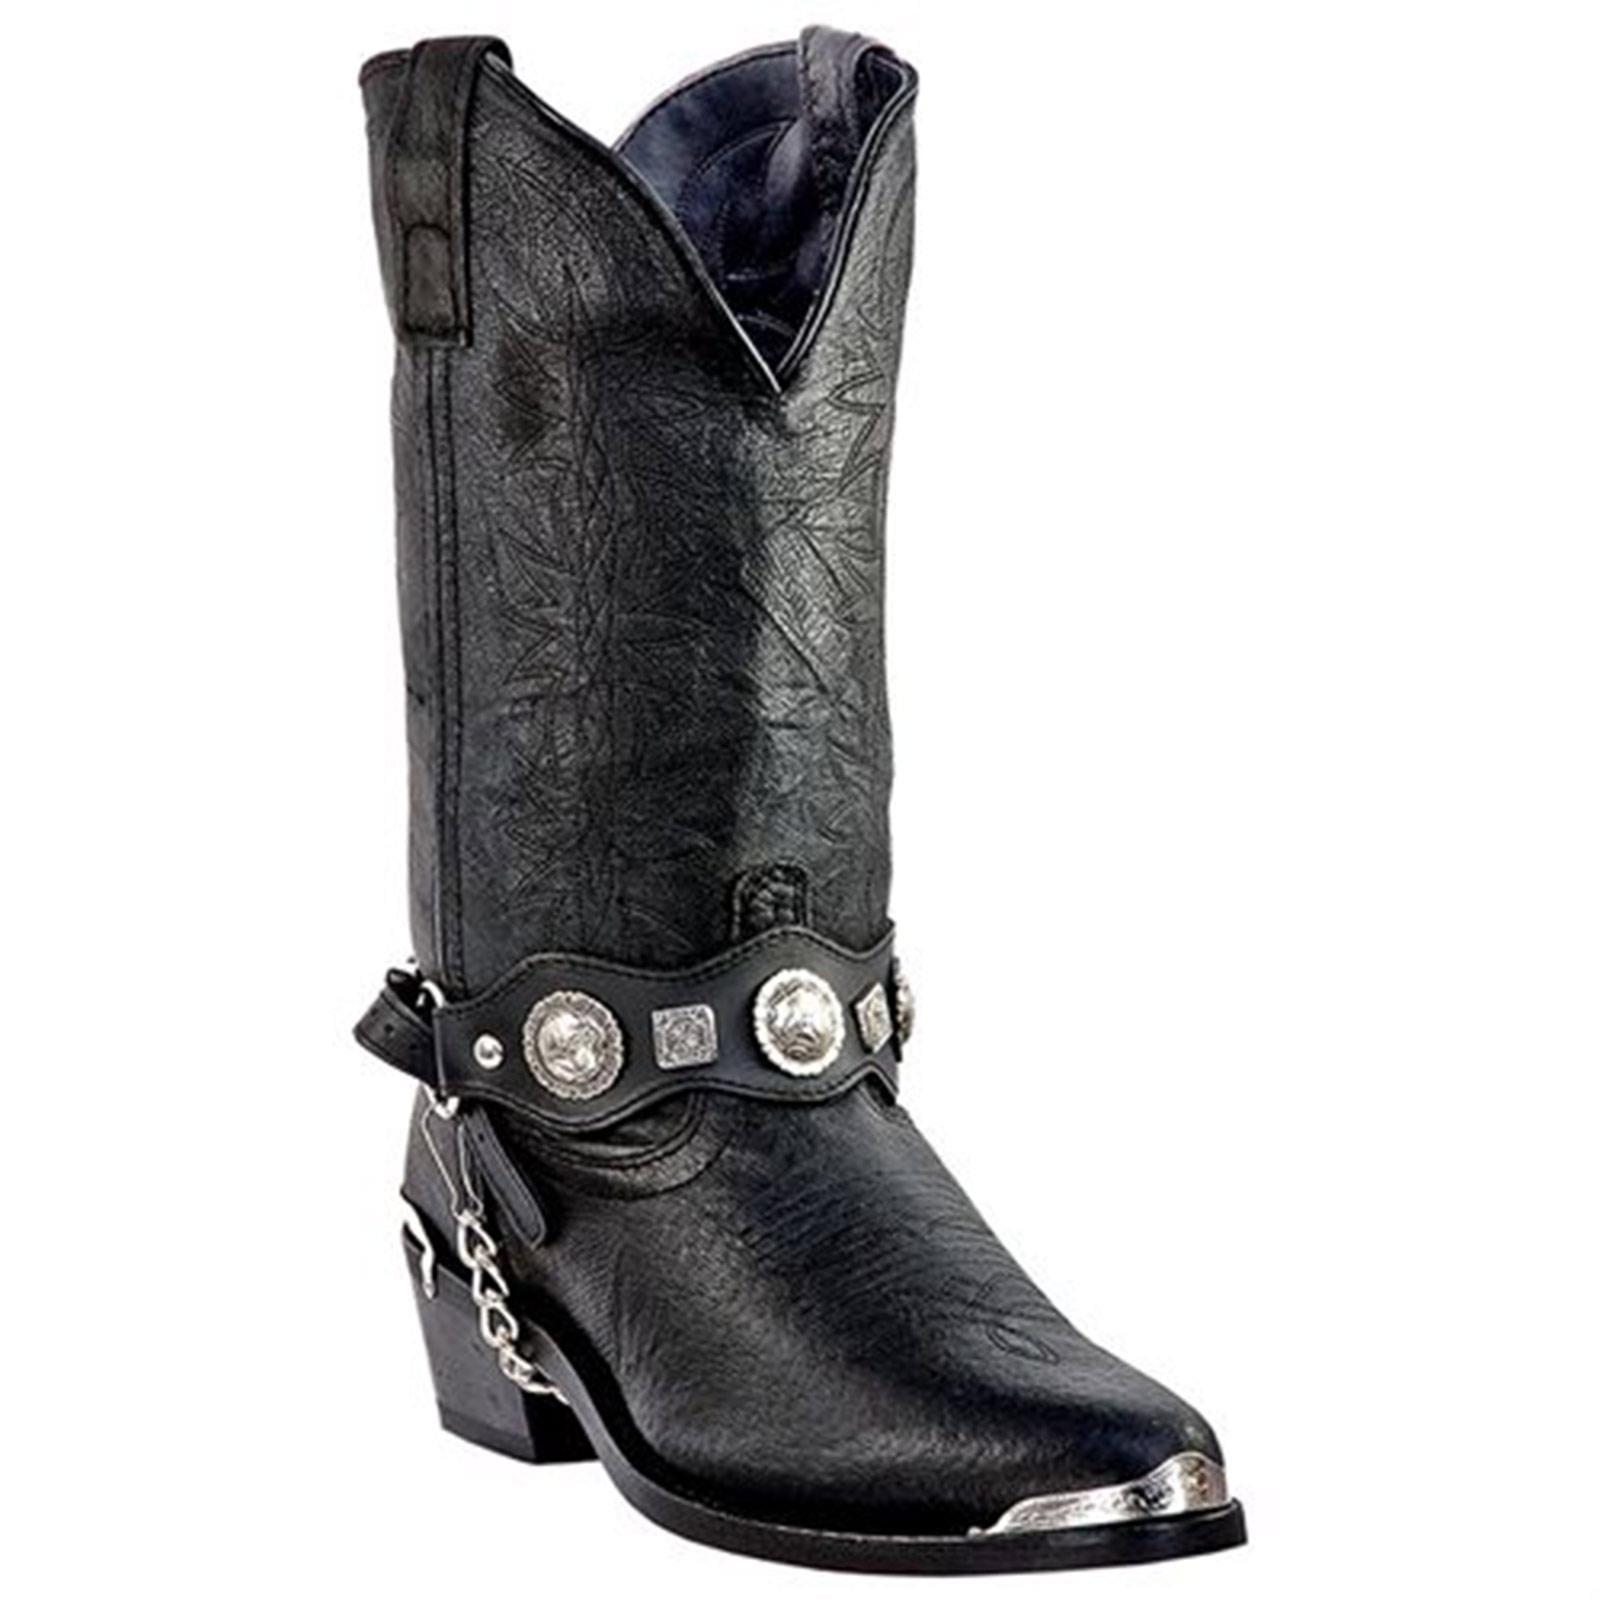 Dingo DI02175 Men's Black Suiter Harnness Western Boots by Dingo